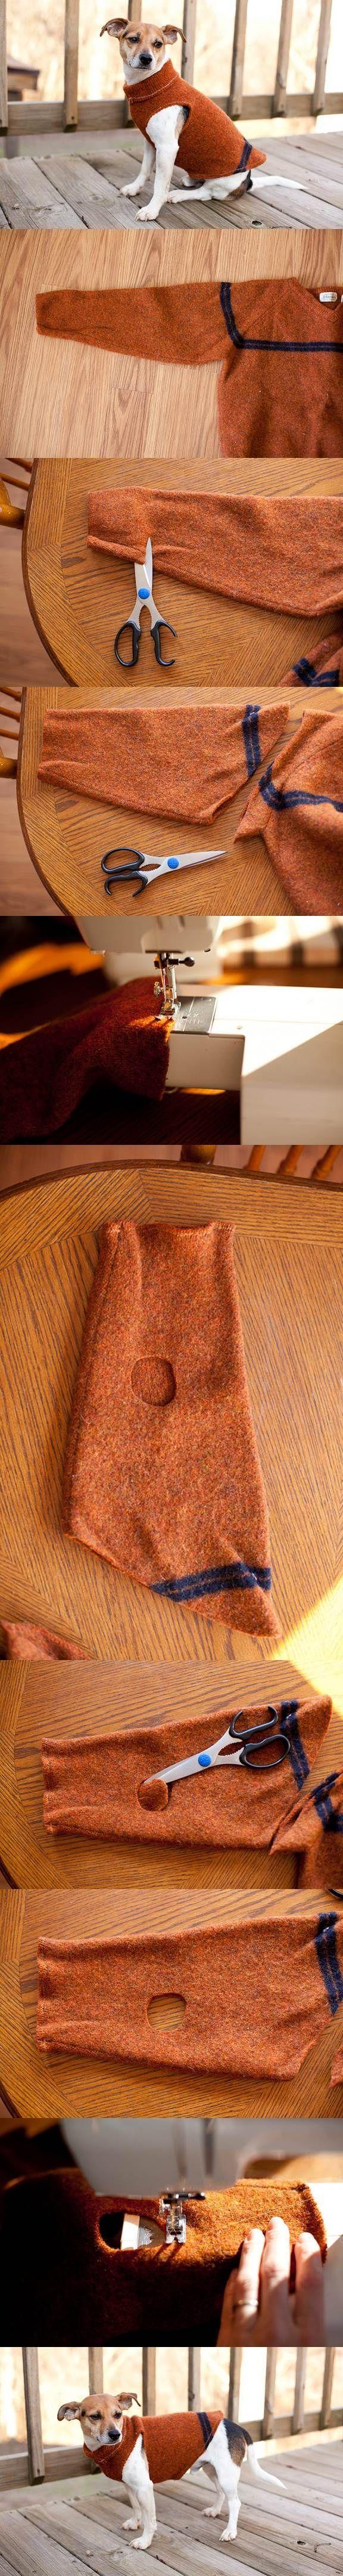 DIY Sweater Sleeve Dog Coat